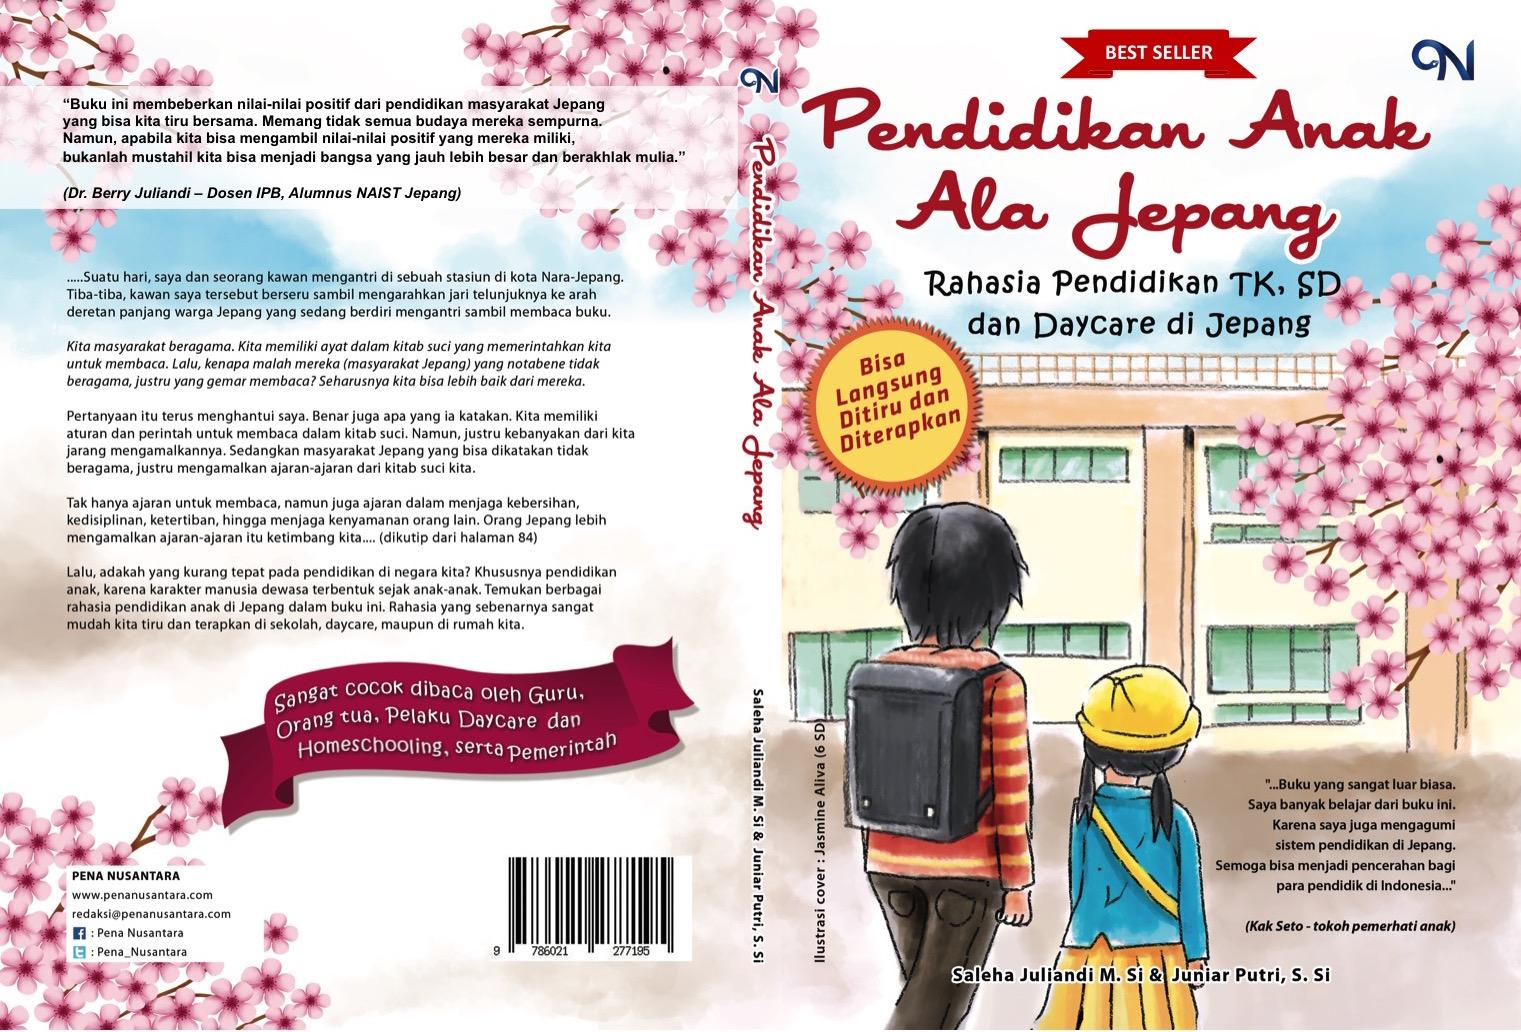 Bagaimanakah Cara Menerbitkan Buku Indie Di Pena Nusantara